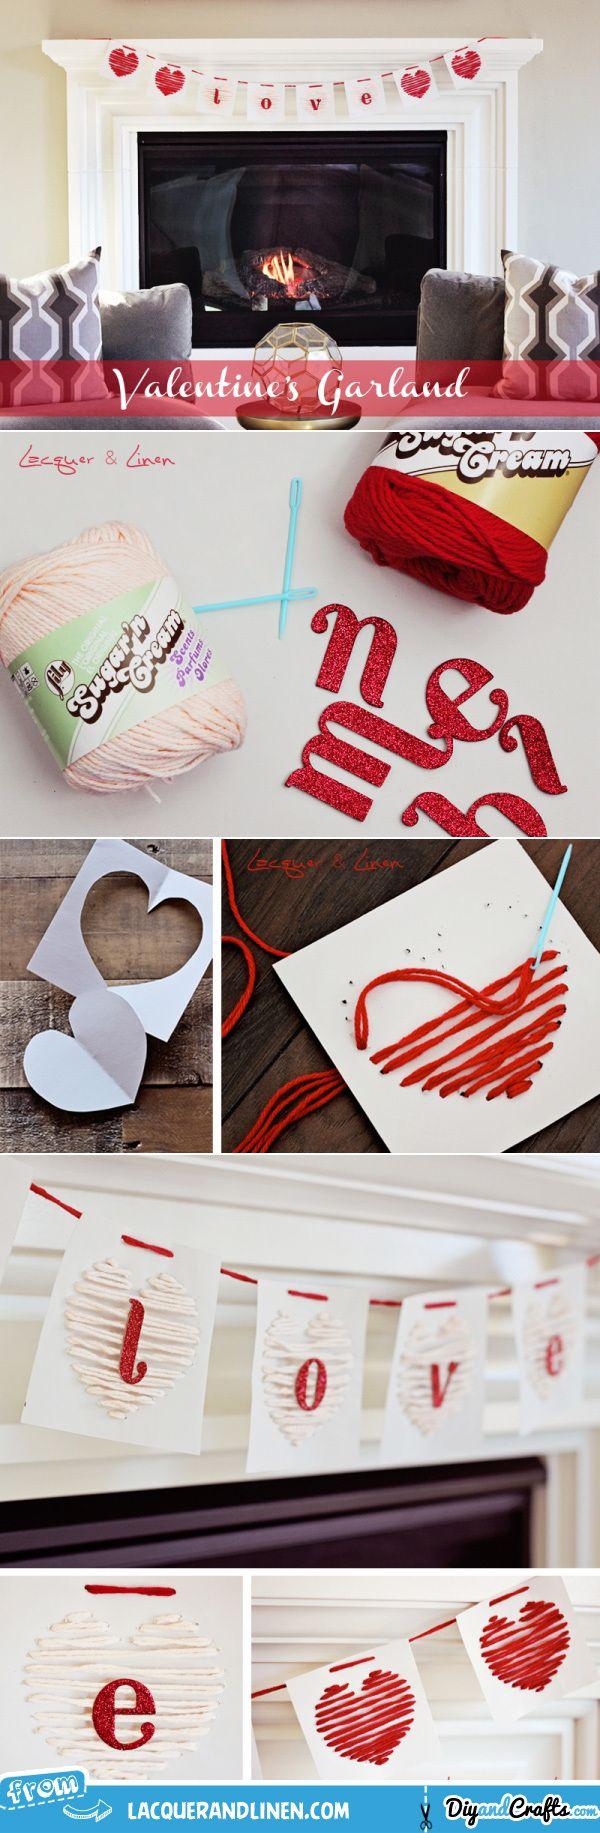 DIY: Yarn Heart Garland   Valentines Day Ideas   #DIY & #Crafts